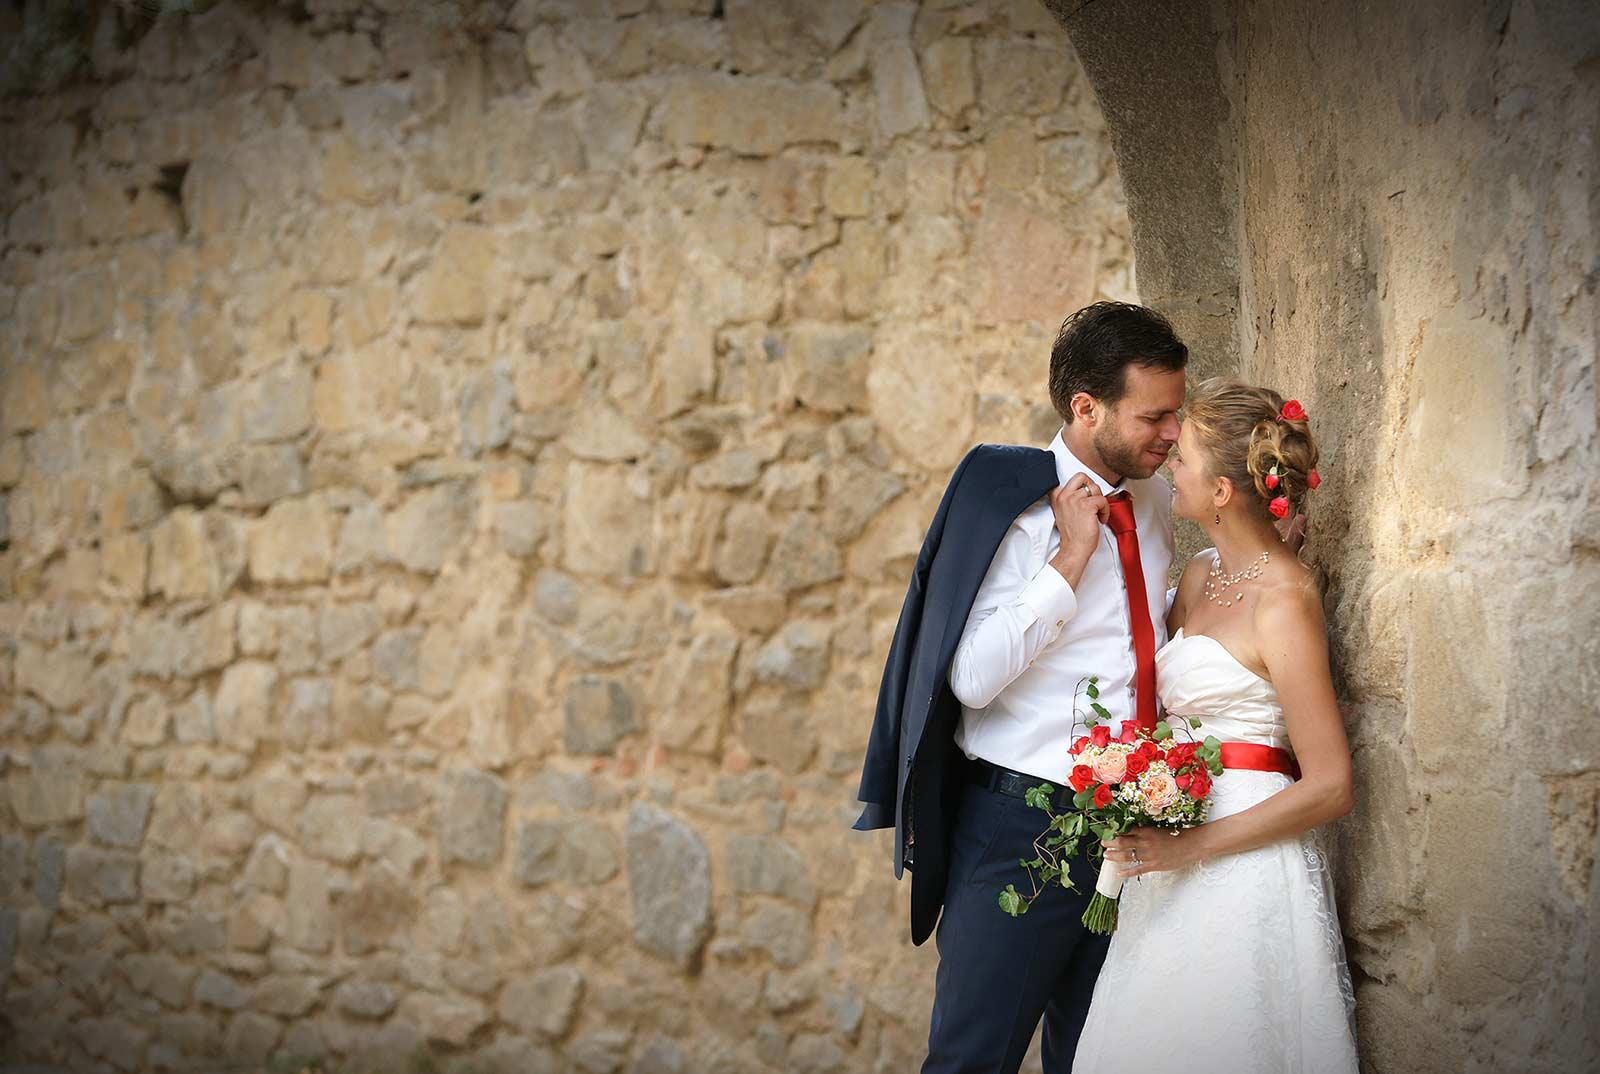 19 svatba svatebni fotograf ales motejl jizni cechy